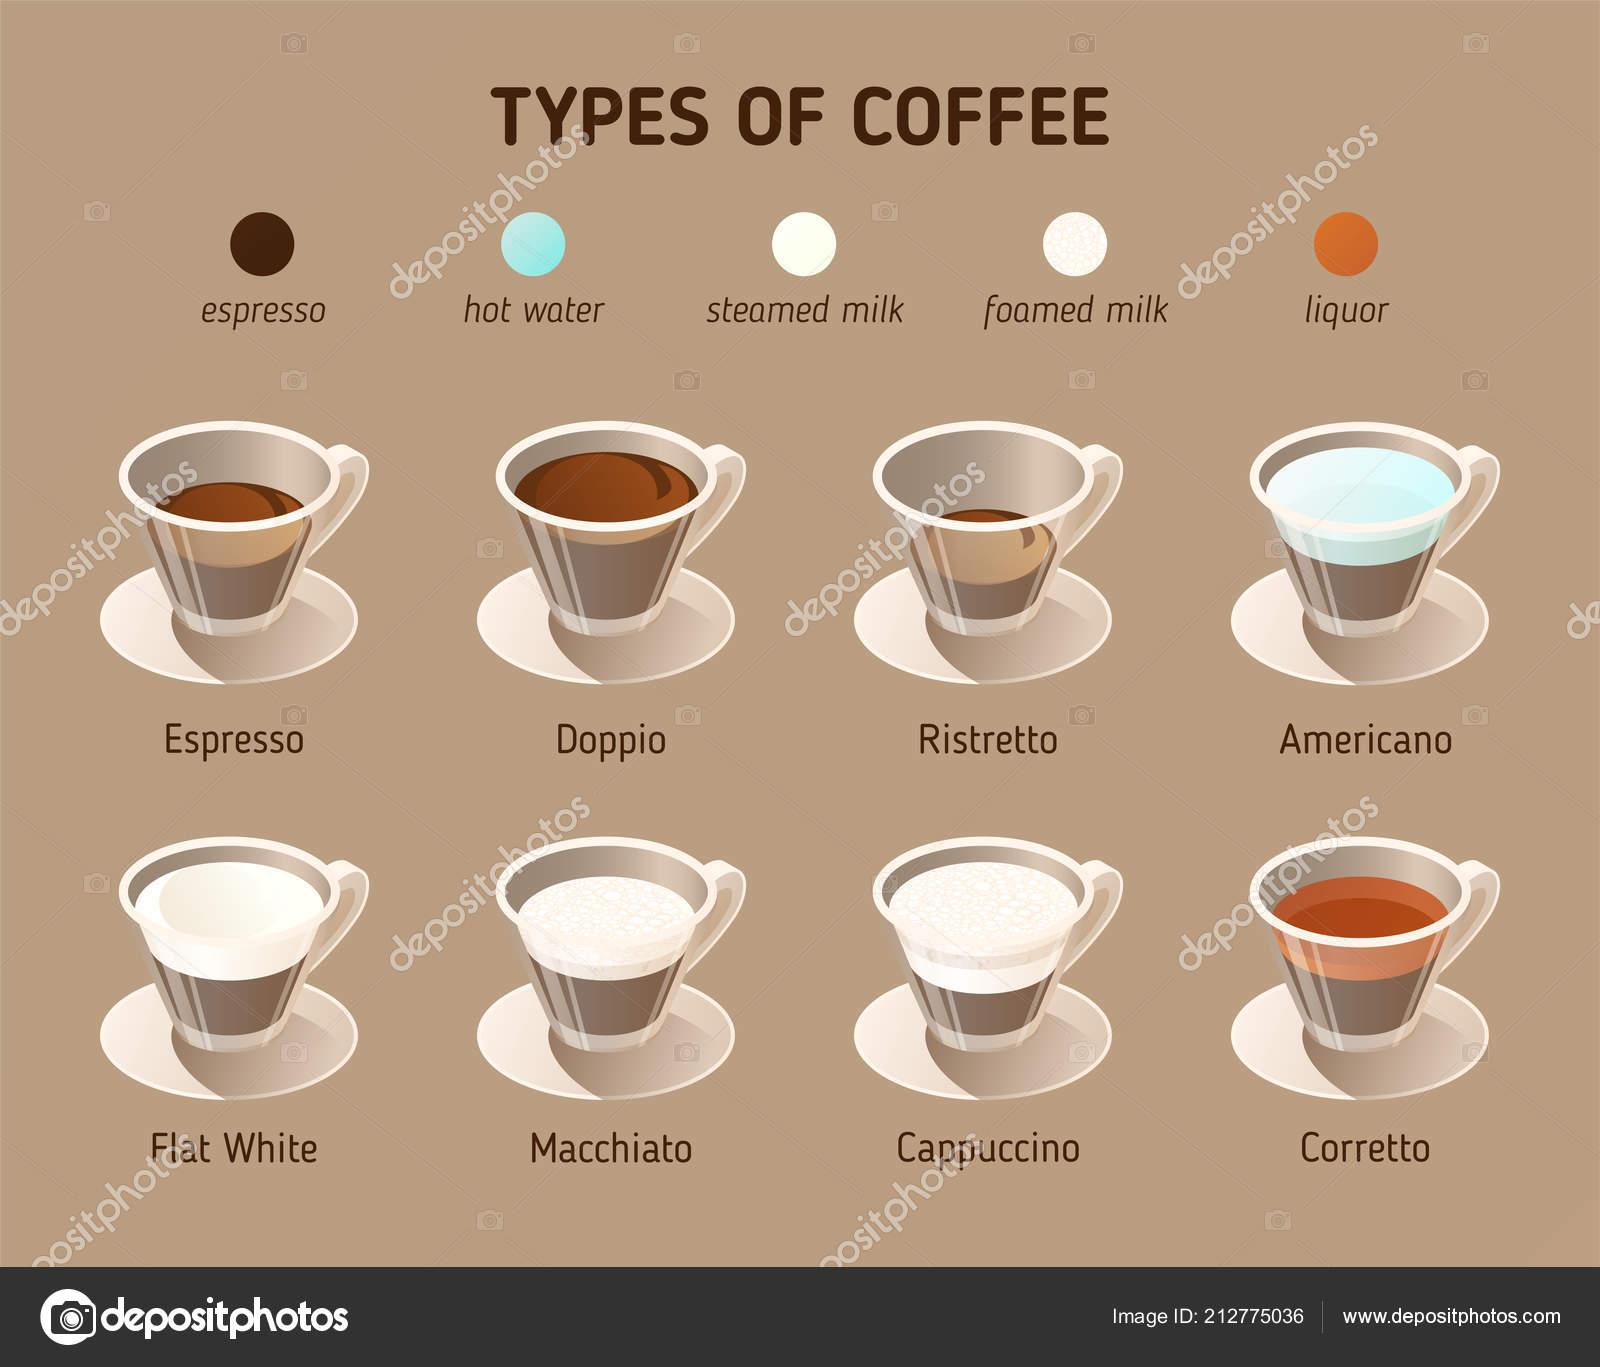 Káva Typy Vektor Izometrické Ikony Infografika Koncept